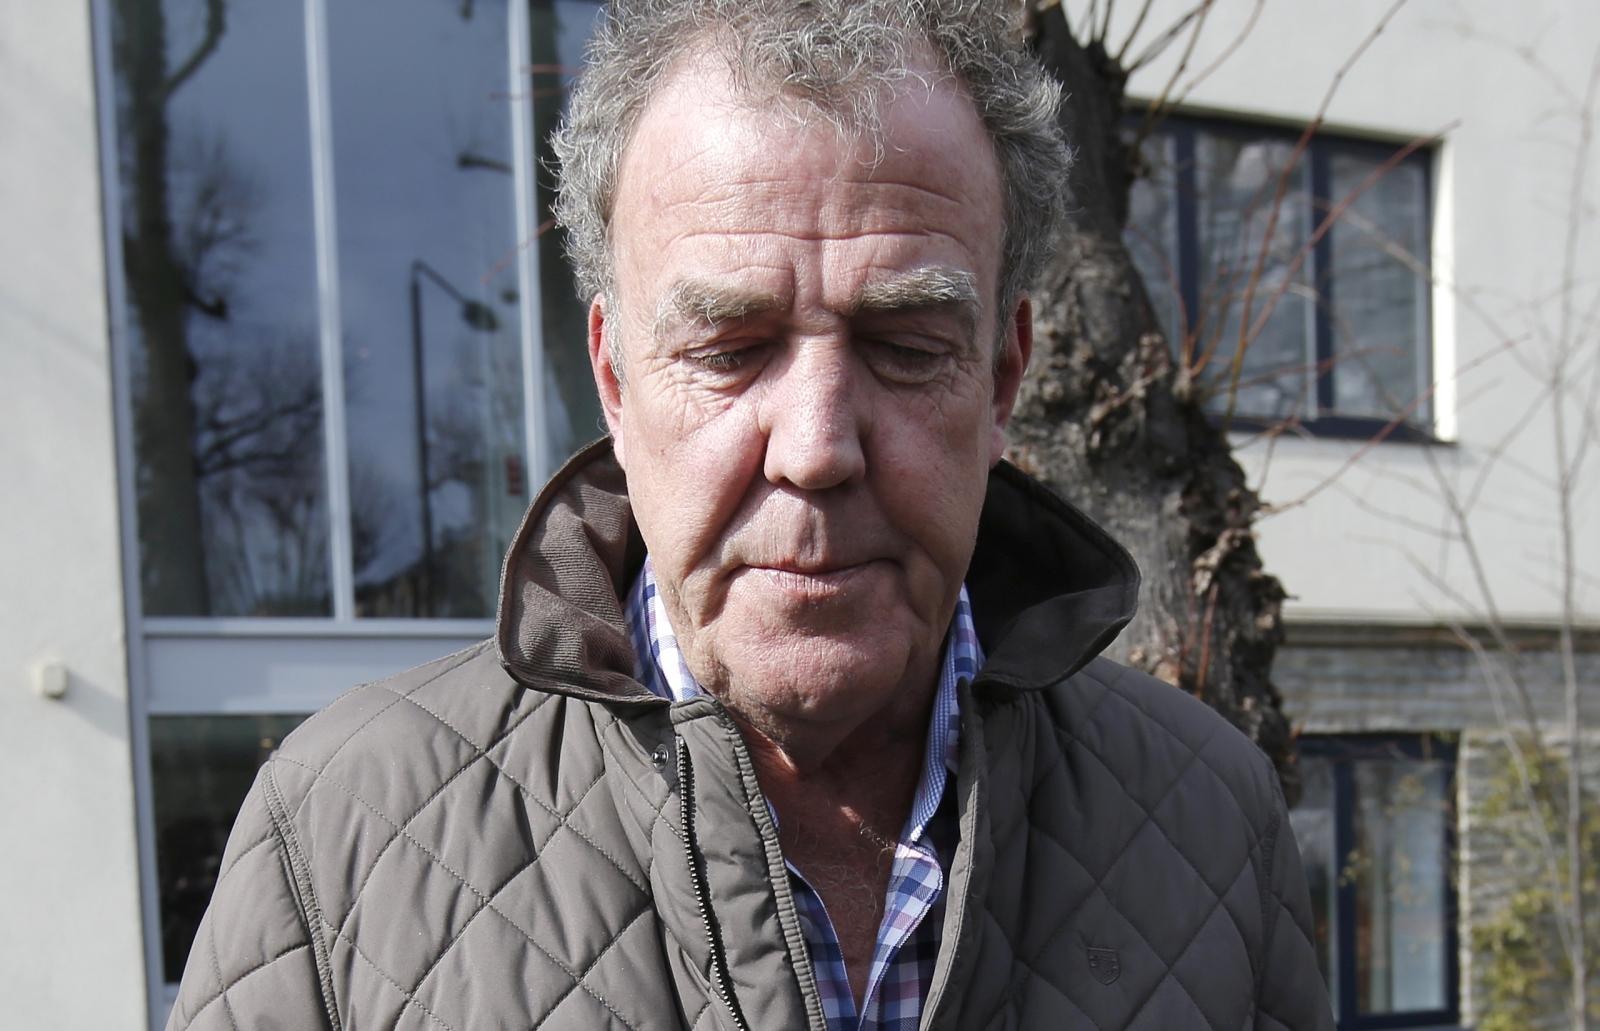 Jeremy Clarkson threatens to sue